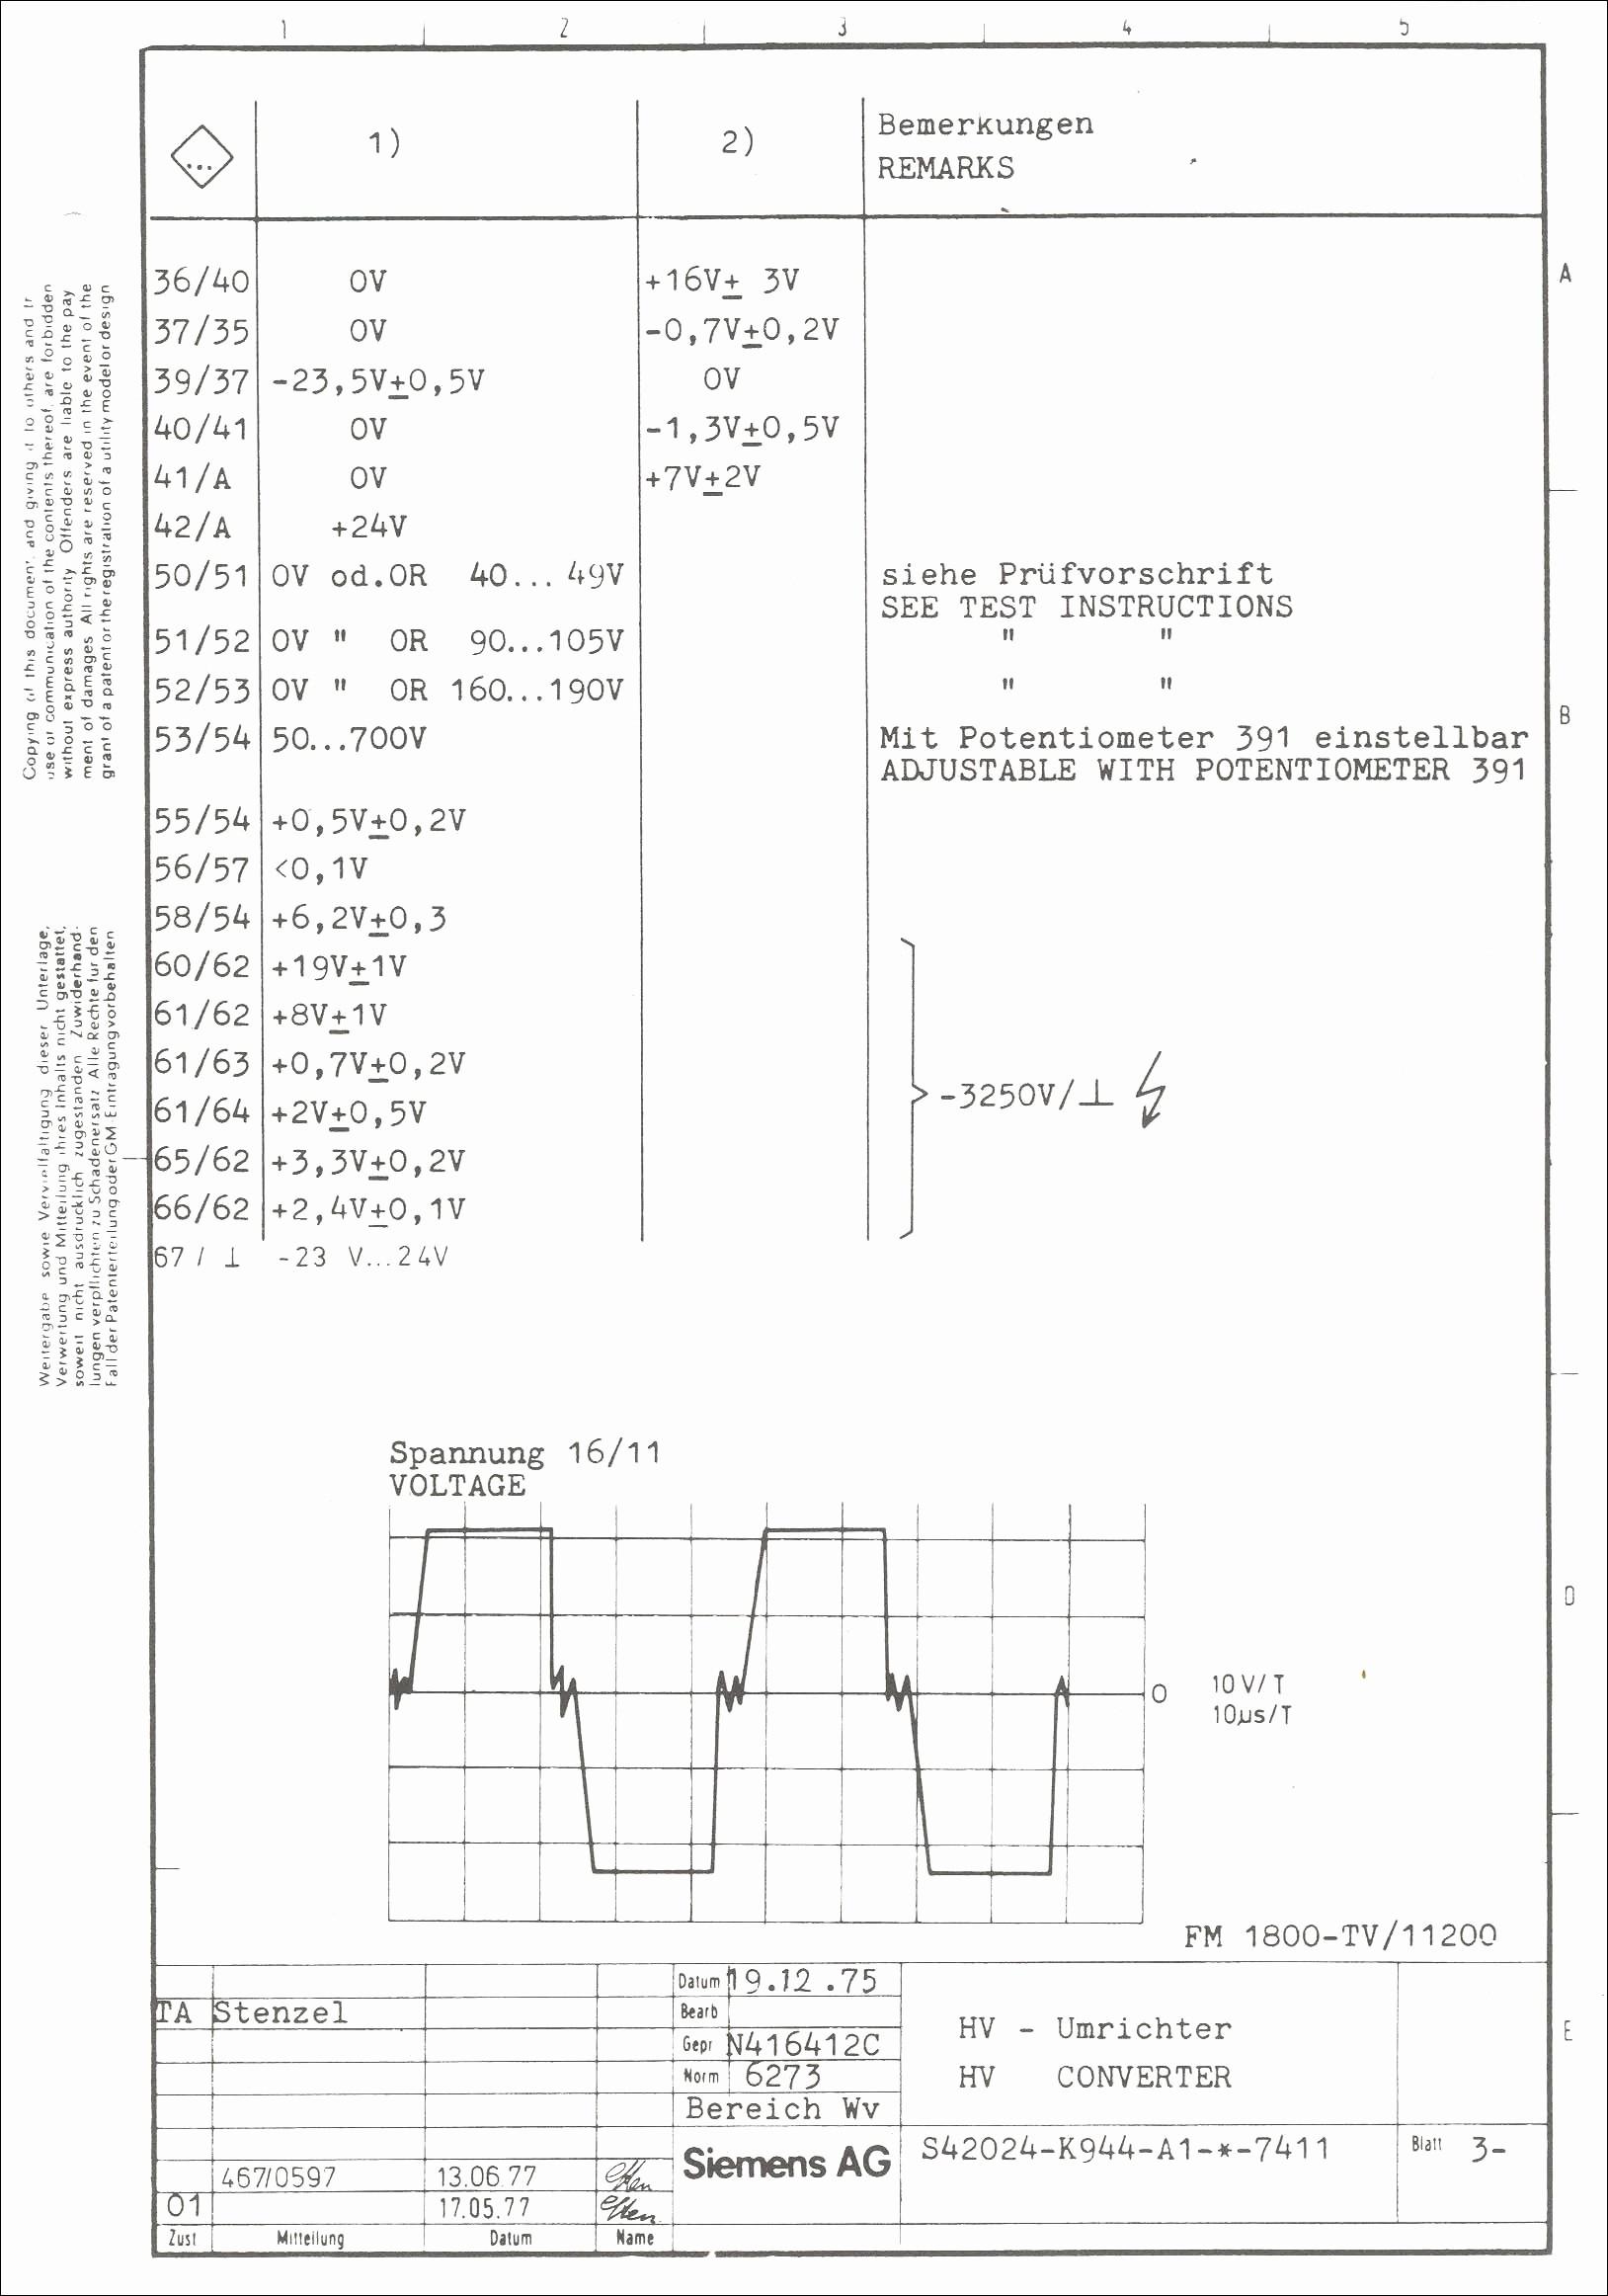 kicker cxa600 1 wiring diagram best of modern kicker l5 subs rh queen int Kicker Cvr Wiring Diagram Rockford Fosgate Amp Wiring Diagram